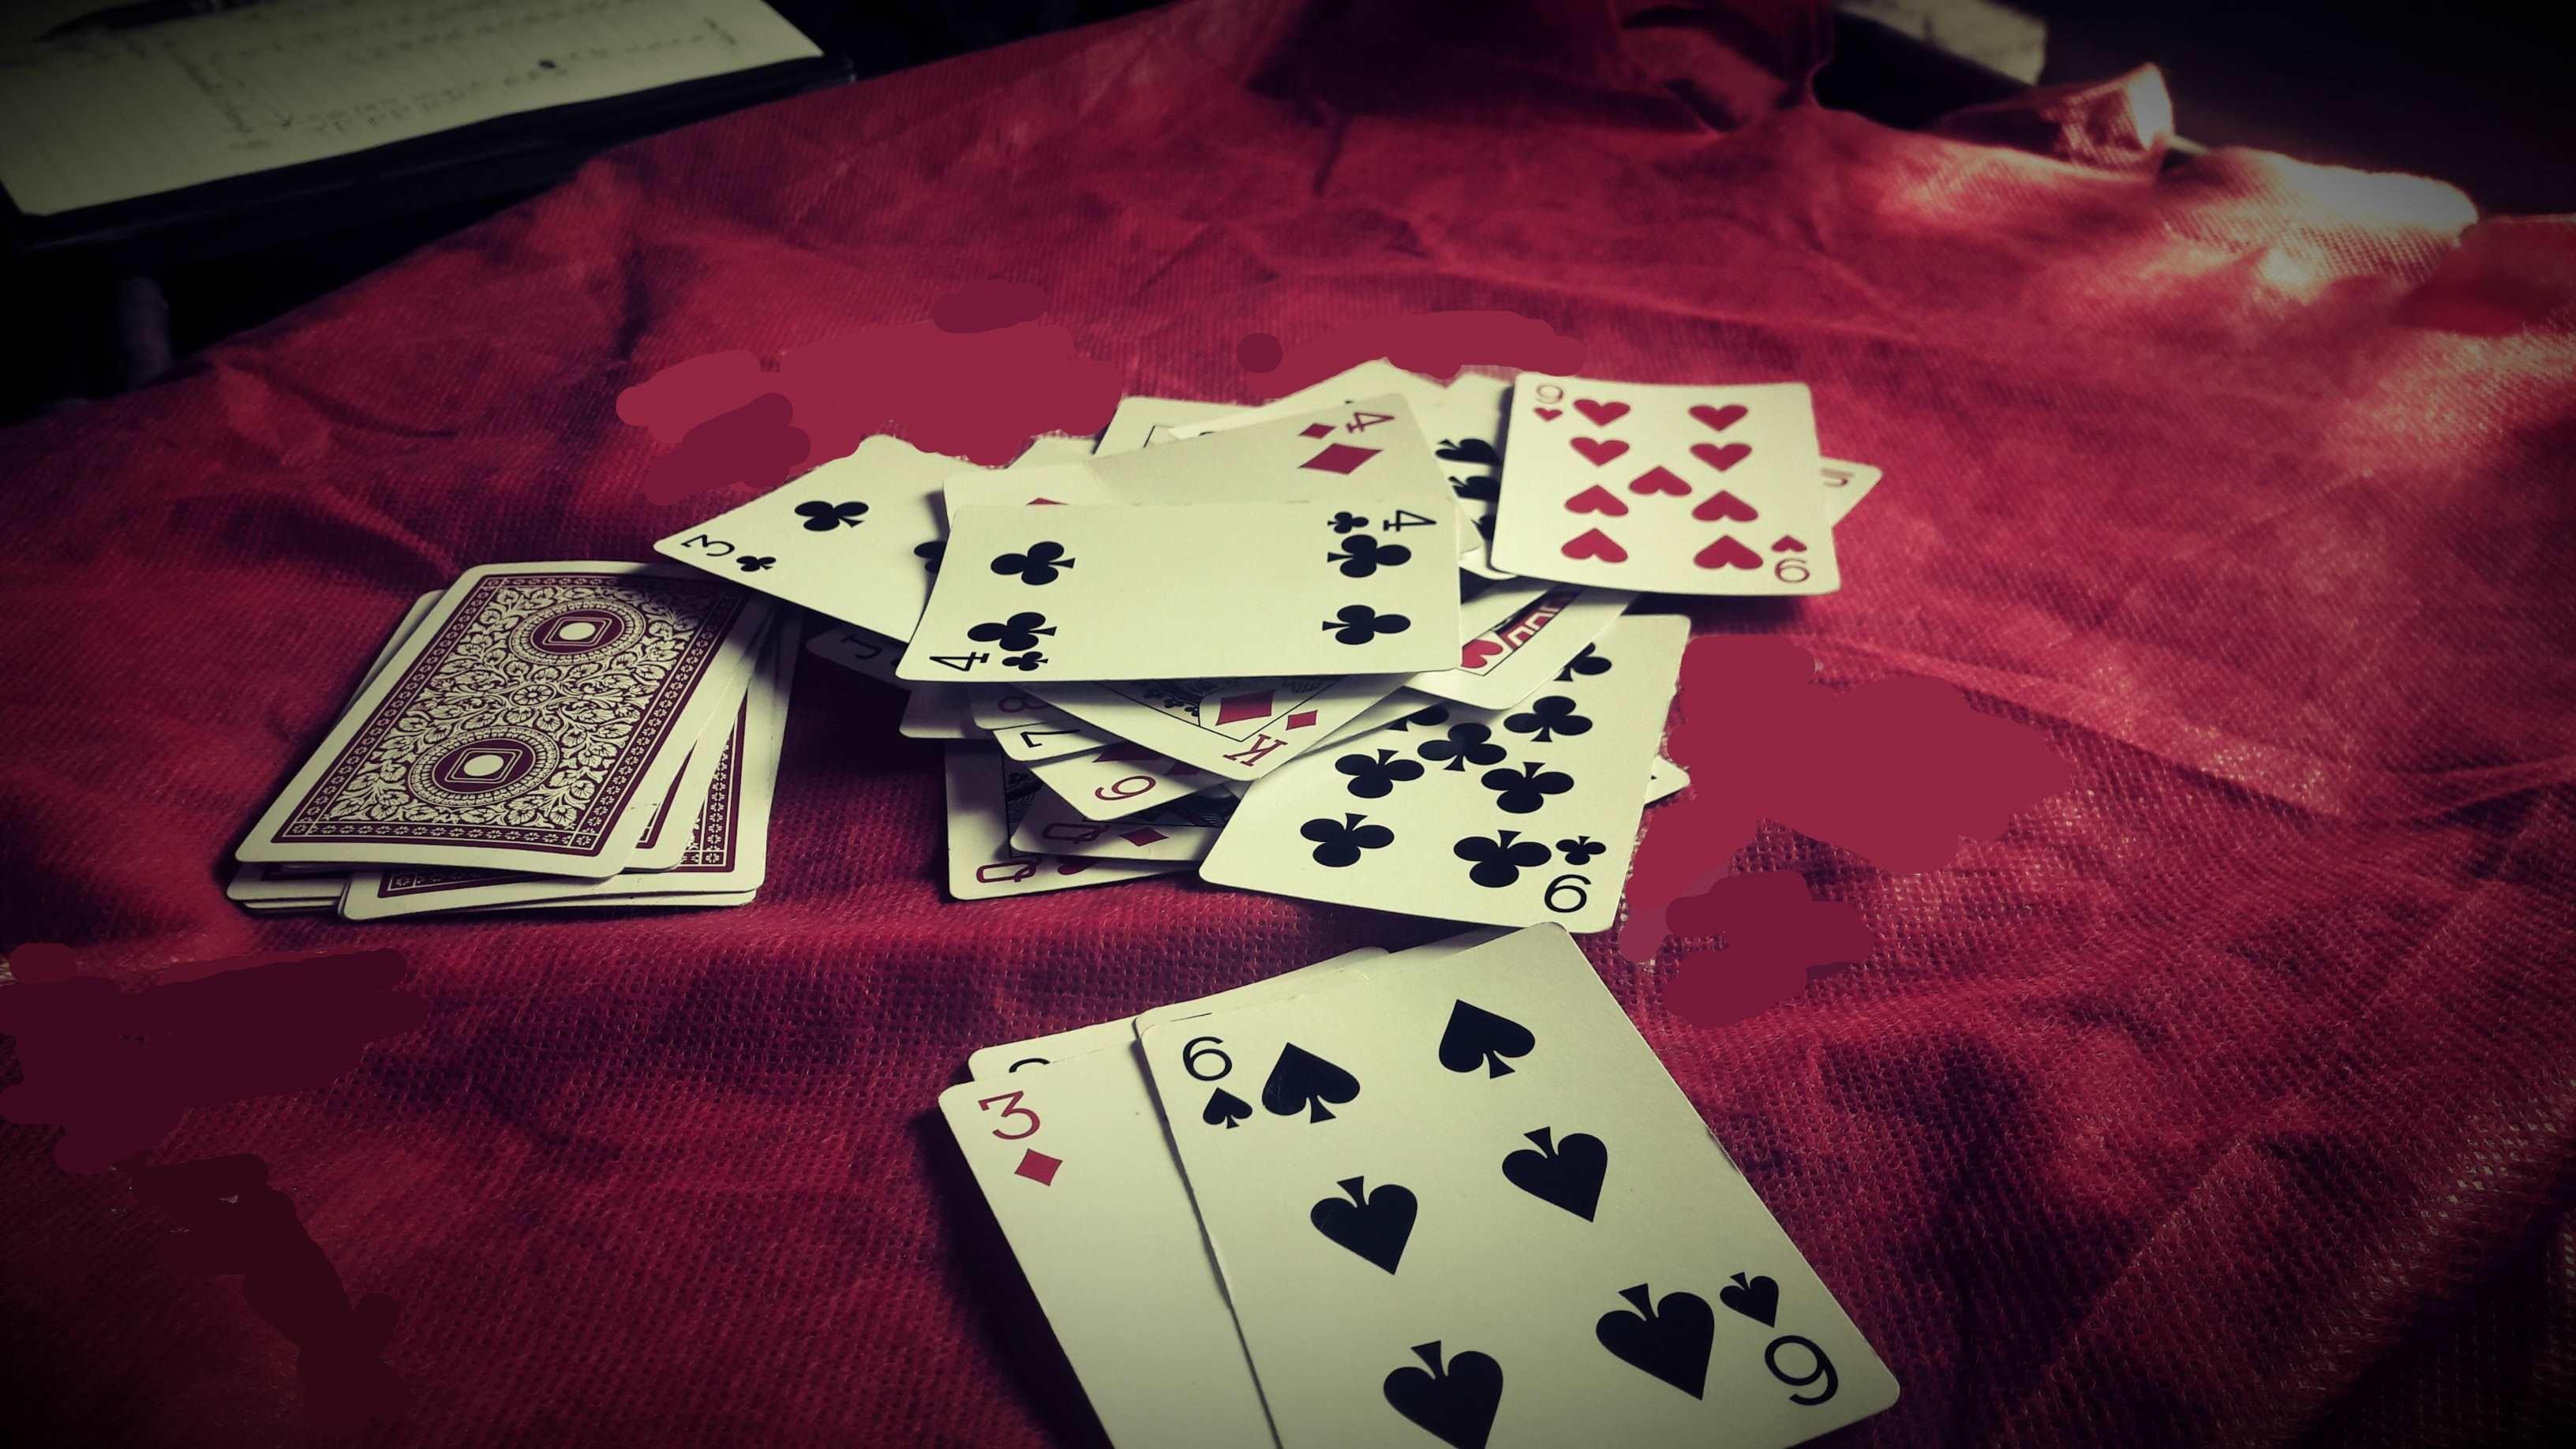 10 free casino spins at Big Spin Casino